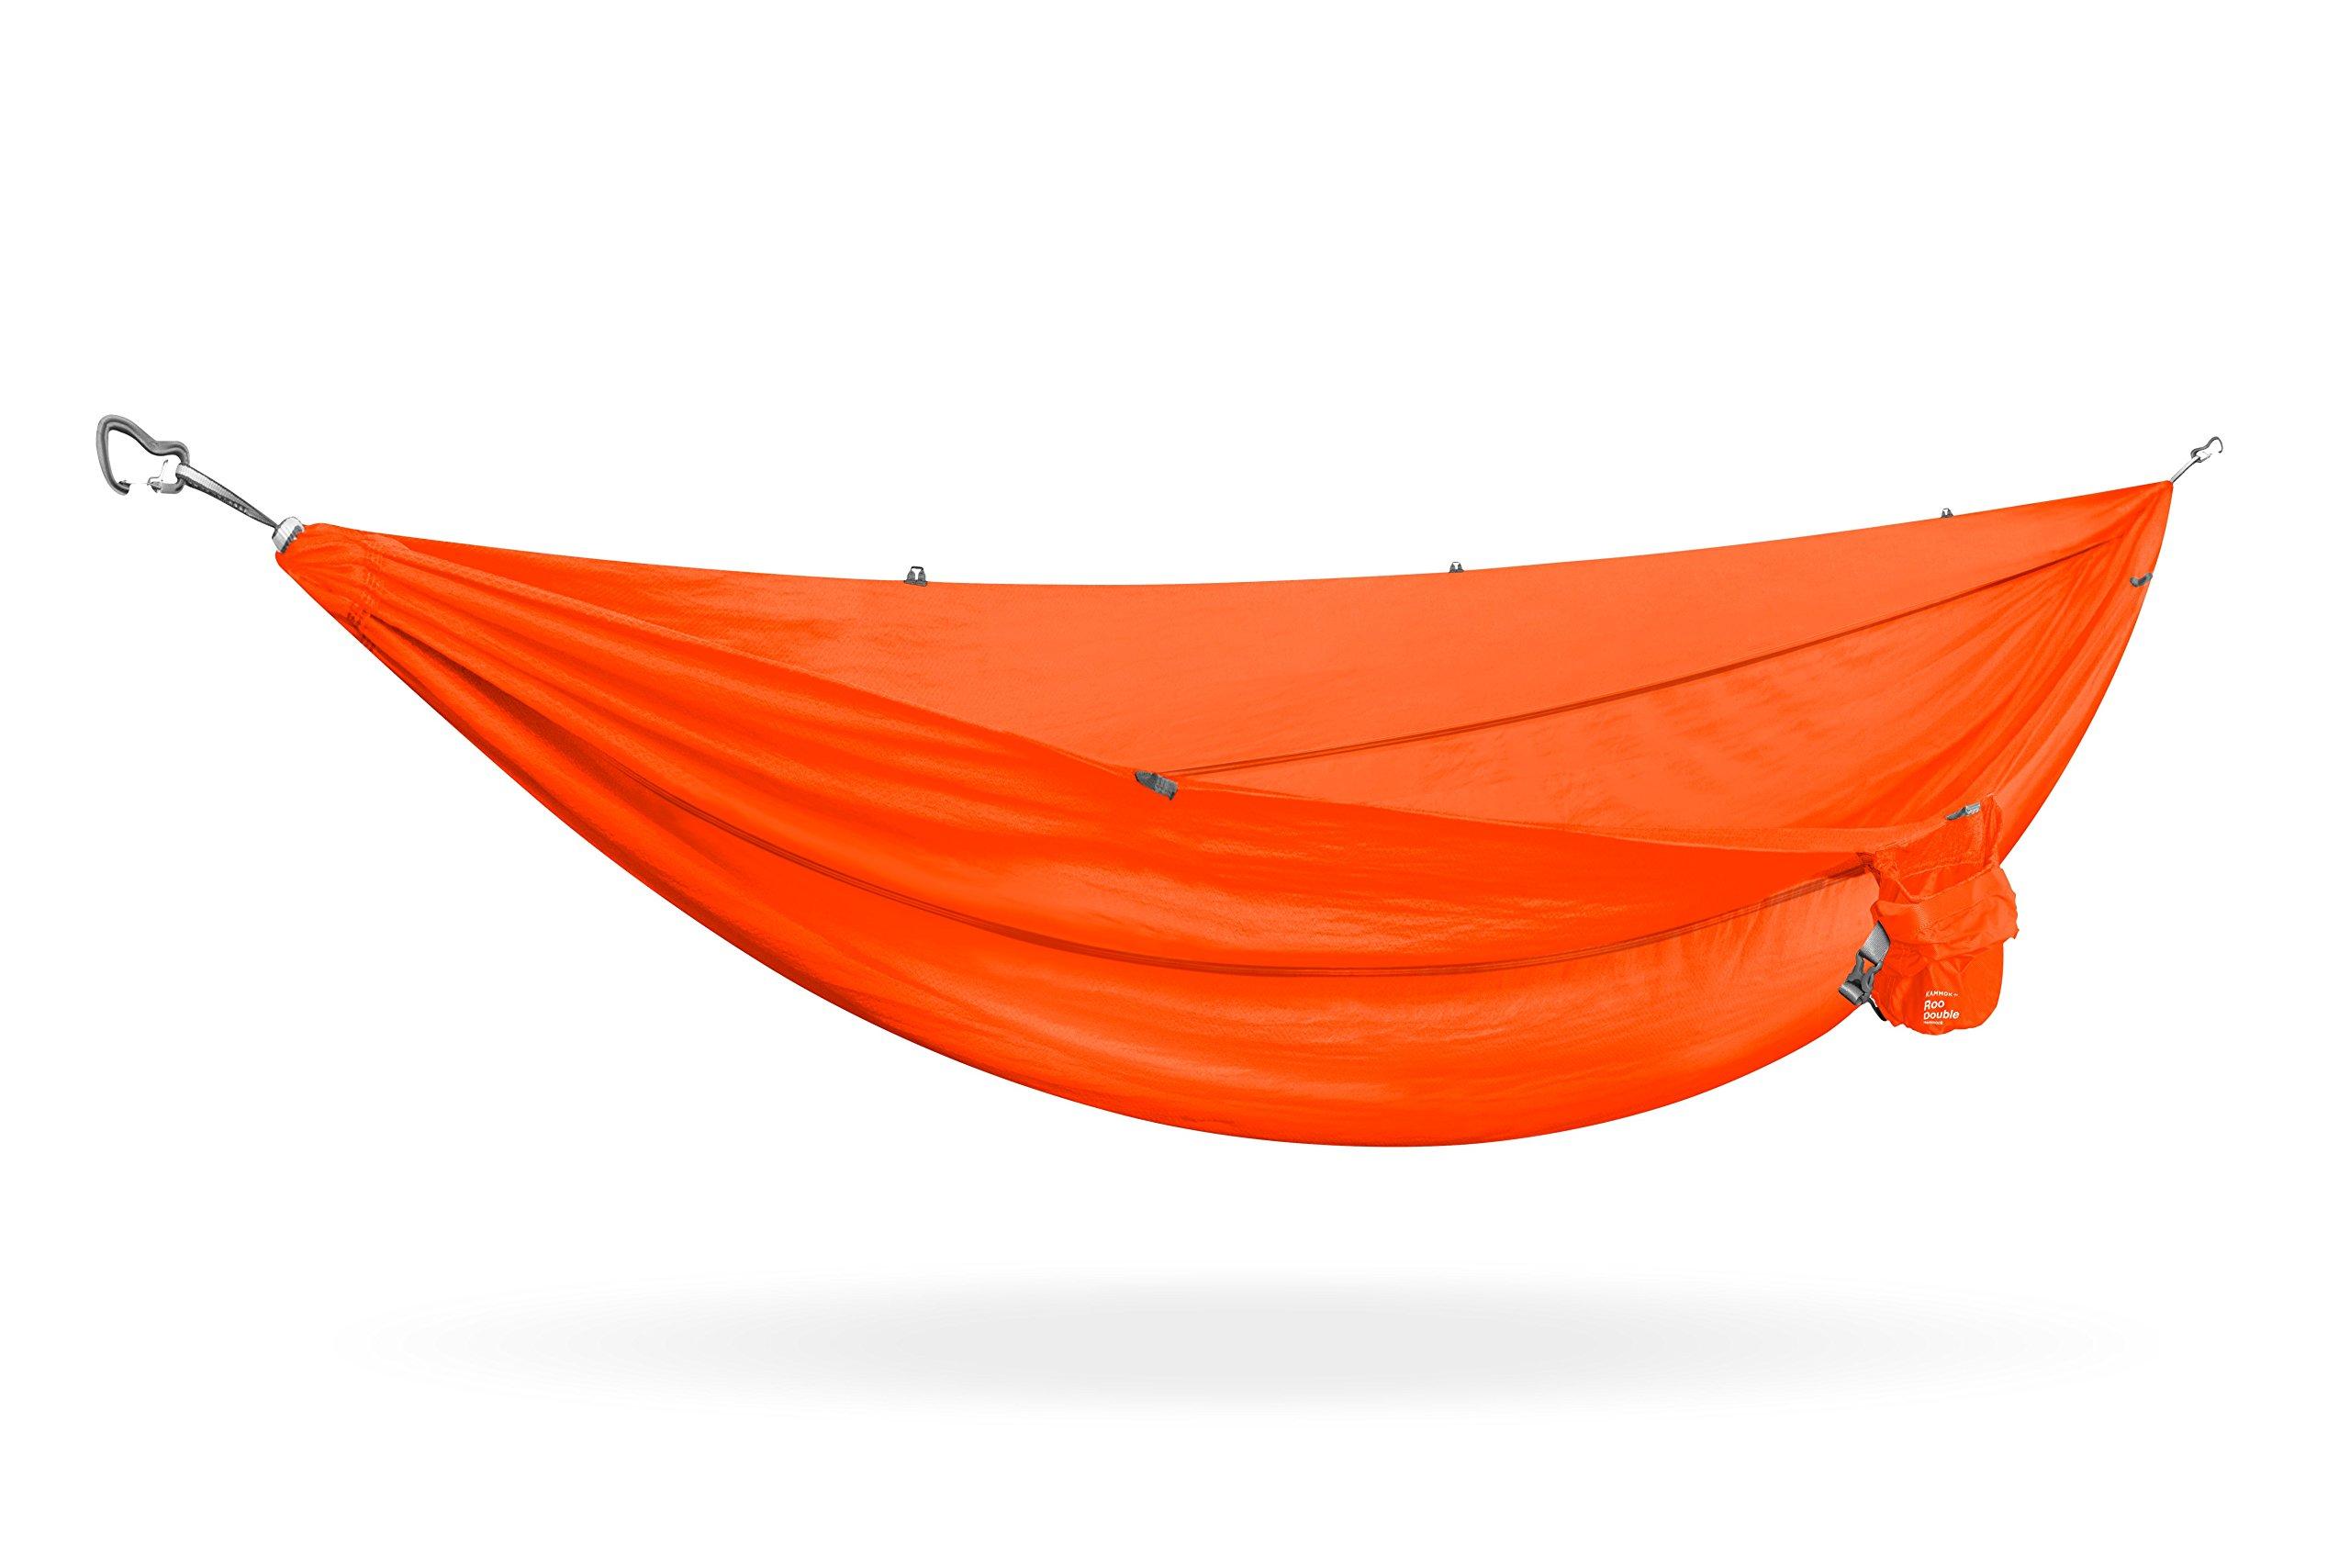 KAMMOK Roo Double Camping Hammock - Ember Orange by KAMMOK